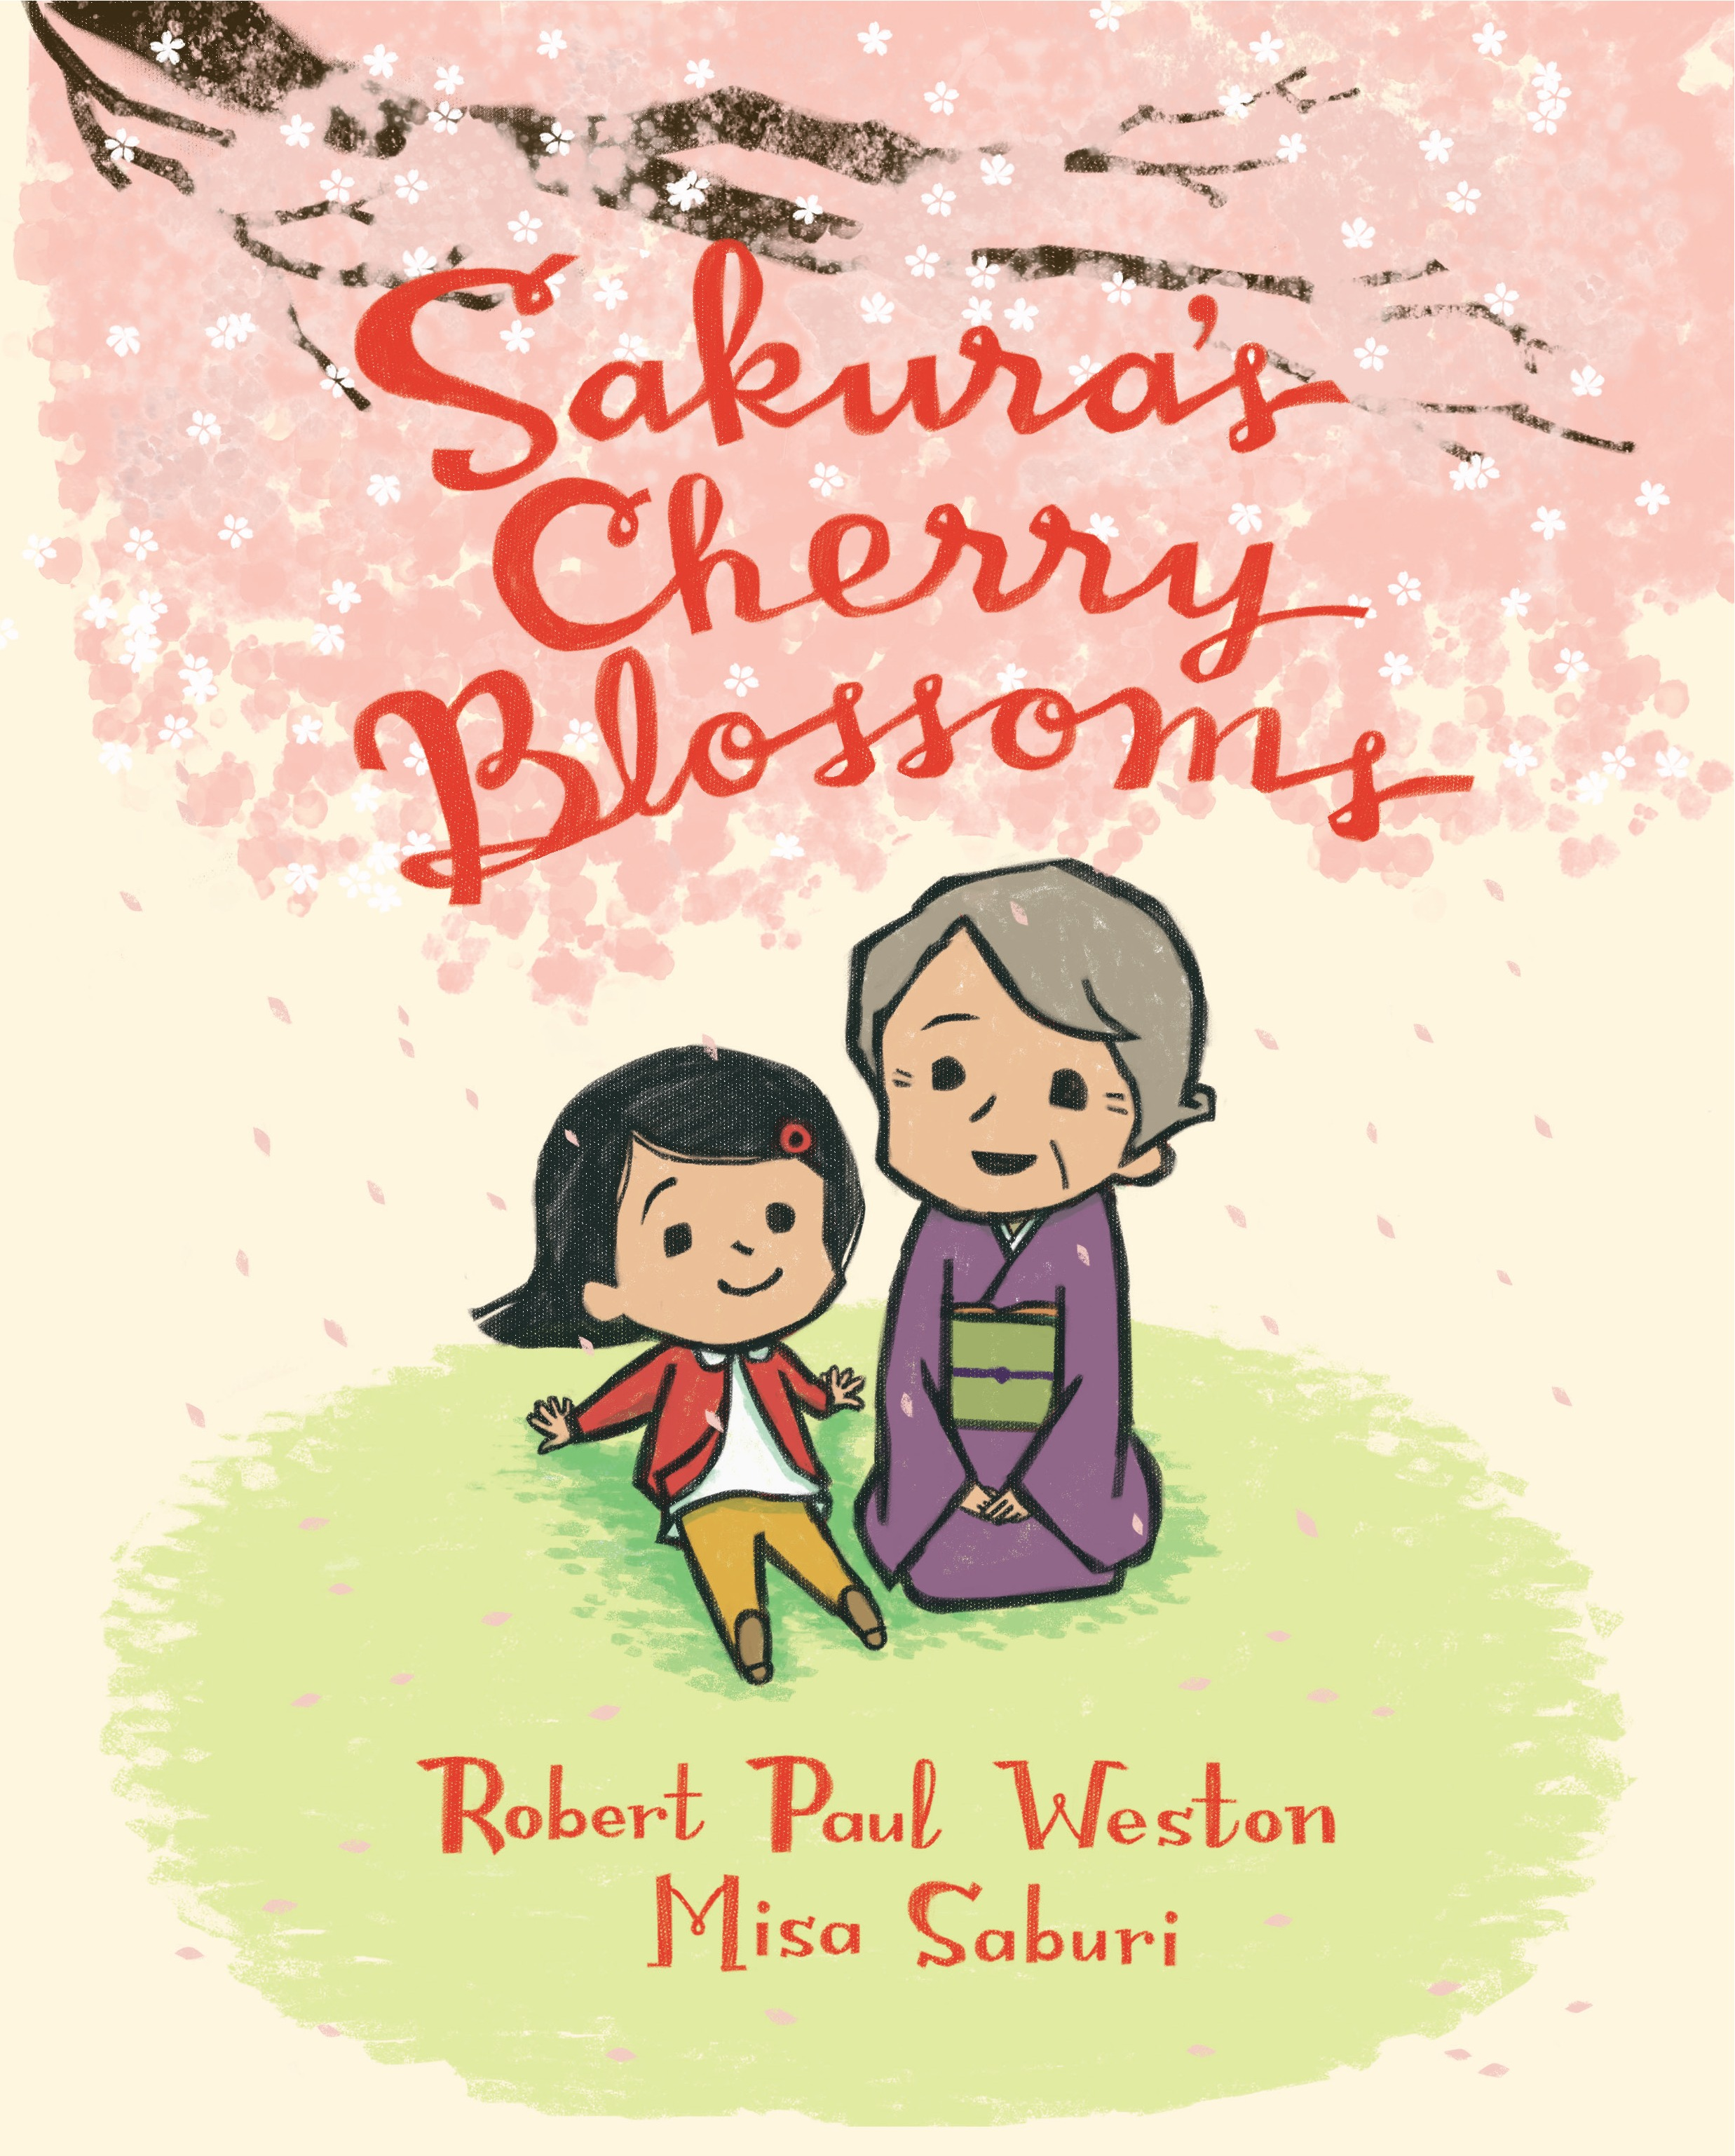 Sunday Story Time with Misa Saburi (Illustrator of Sakura's Cherry Blossoms)